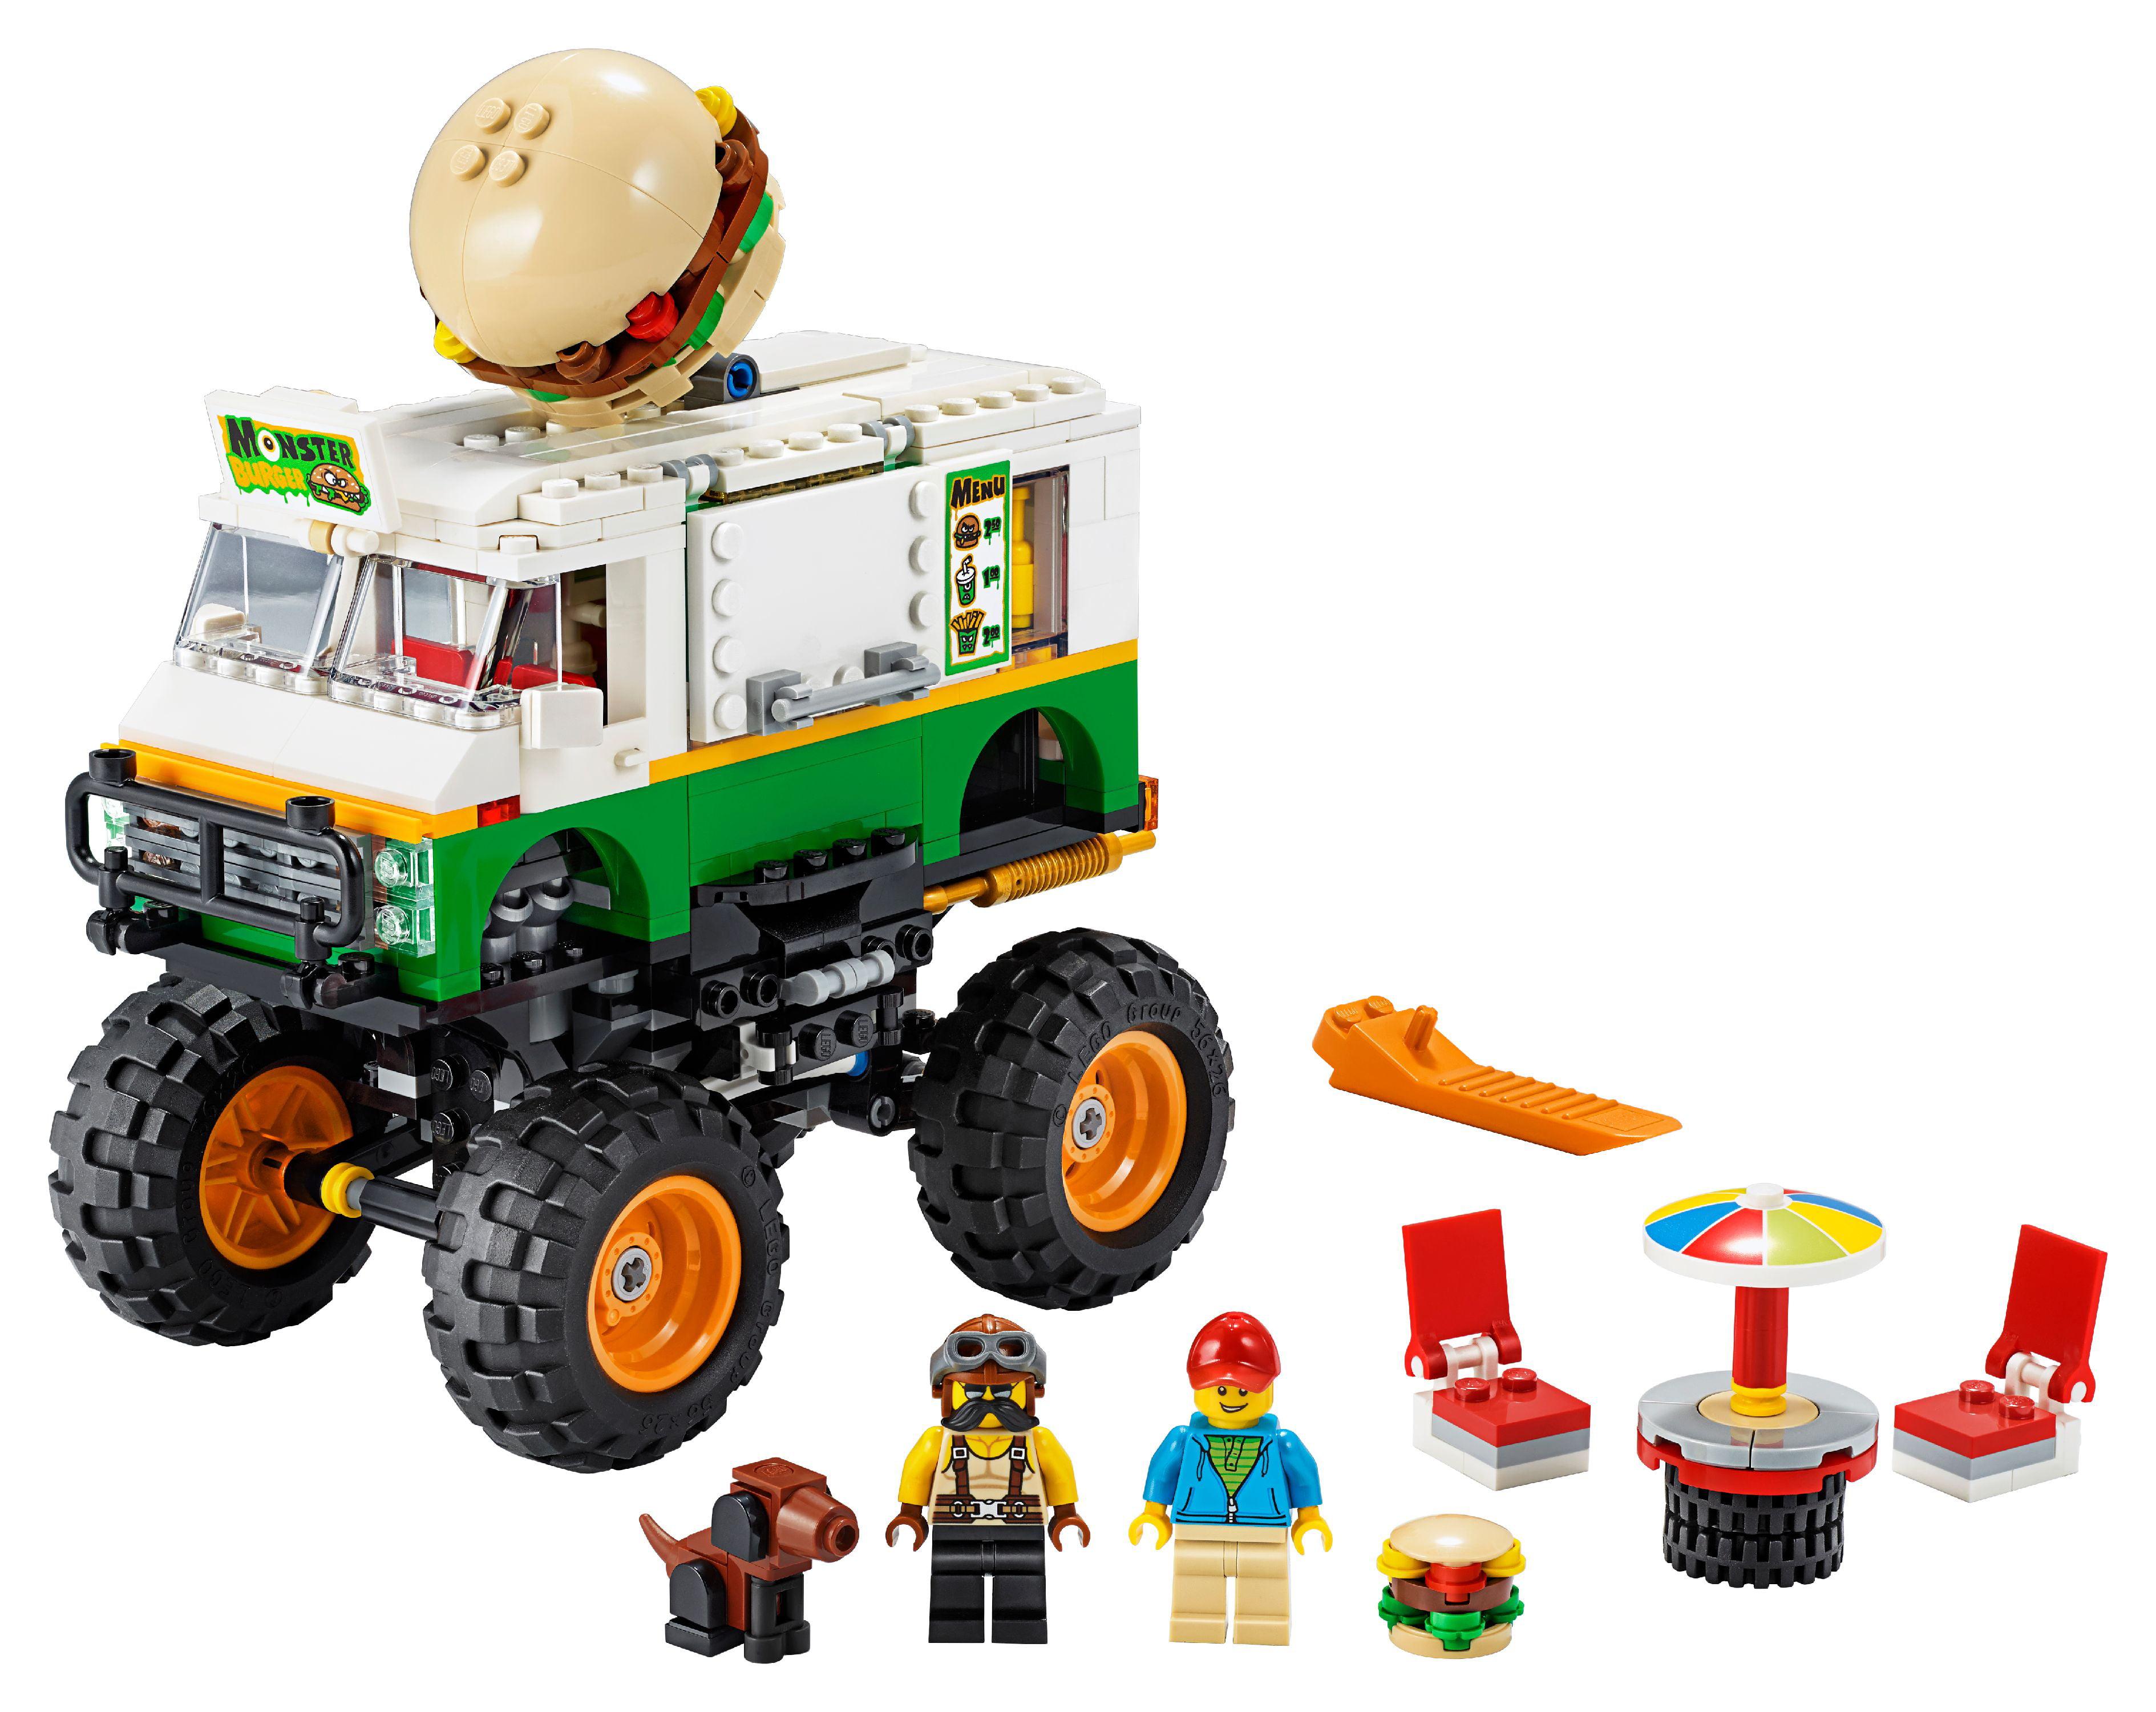 Lego Creator 3in1 Monster Burger Truck 31104 Vehicle Building Kit For Kids 499 Pieces Walmart Com Walmart Com